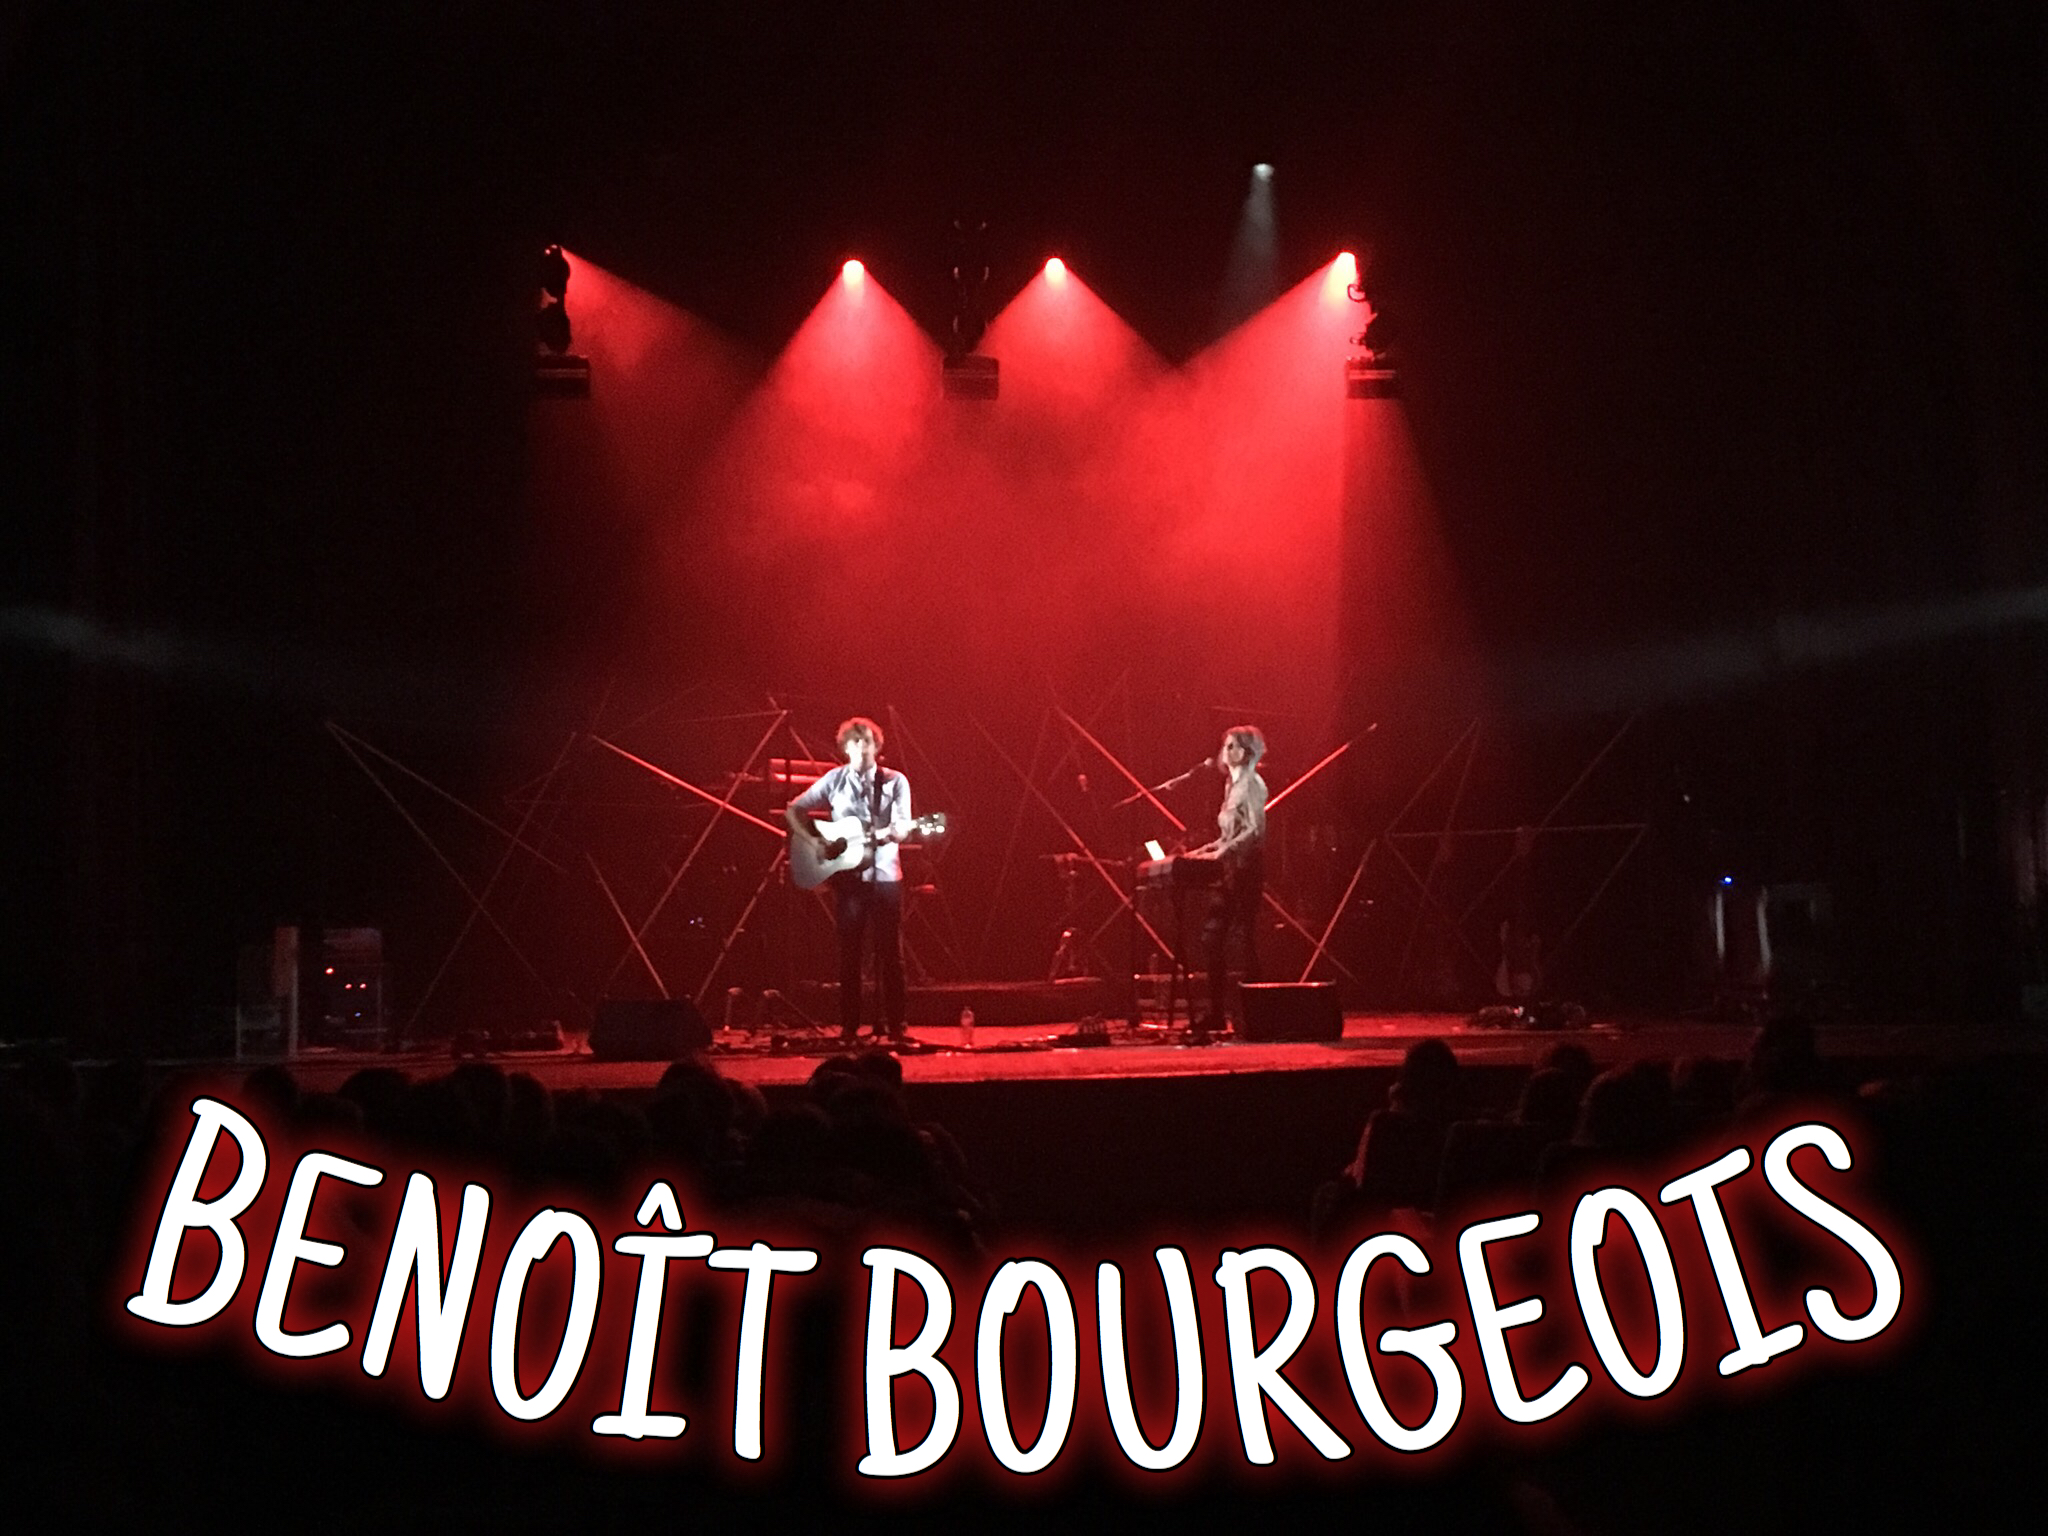 Benoît Bourgeois